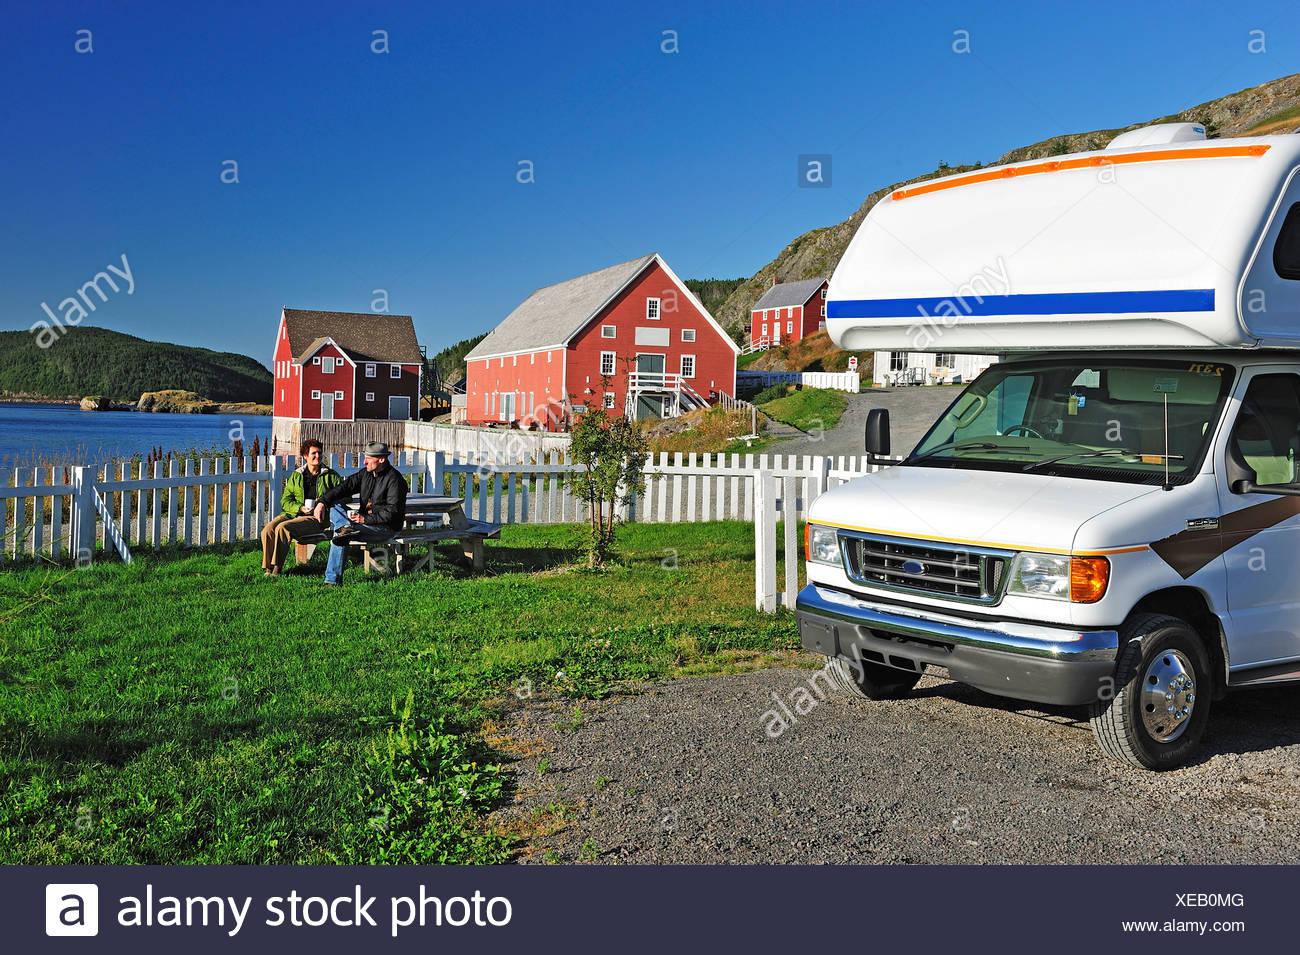 couple, man, woman, Motorhome, RV, Camper, Trinity, Newfoundland, Canada - Stock Image